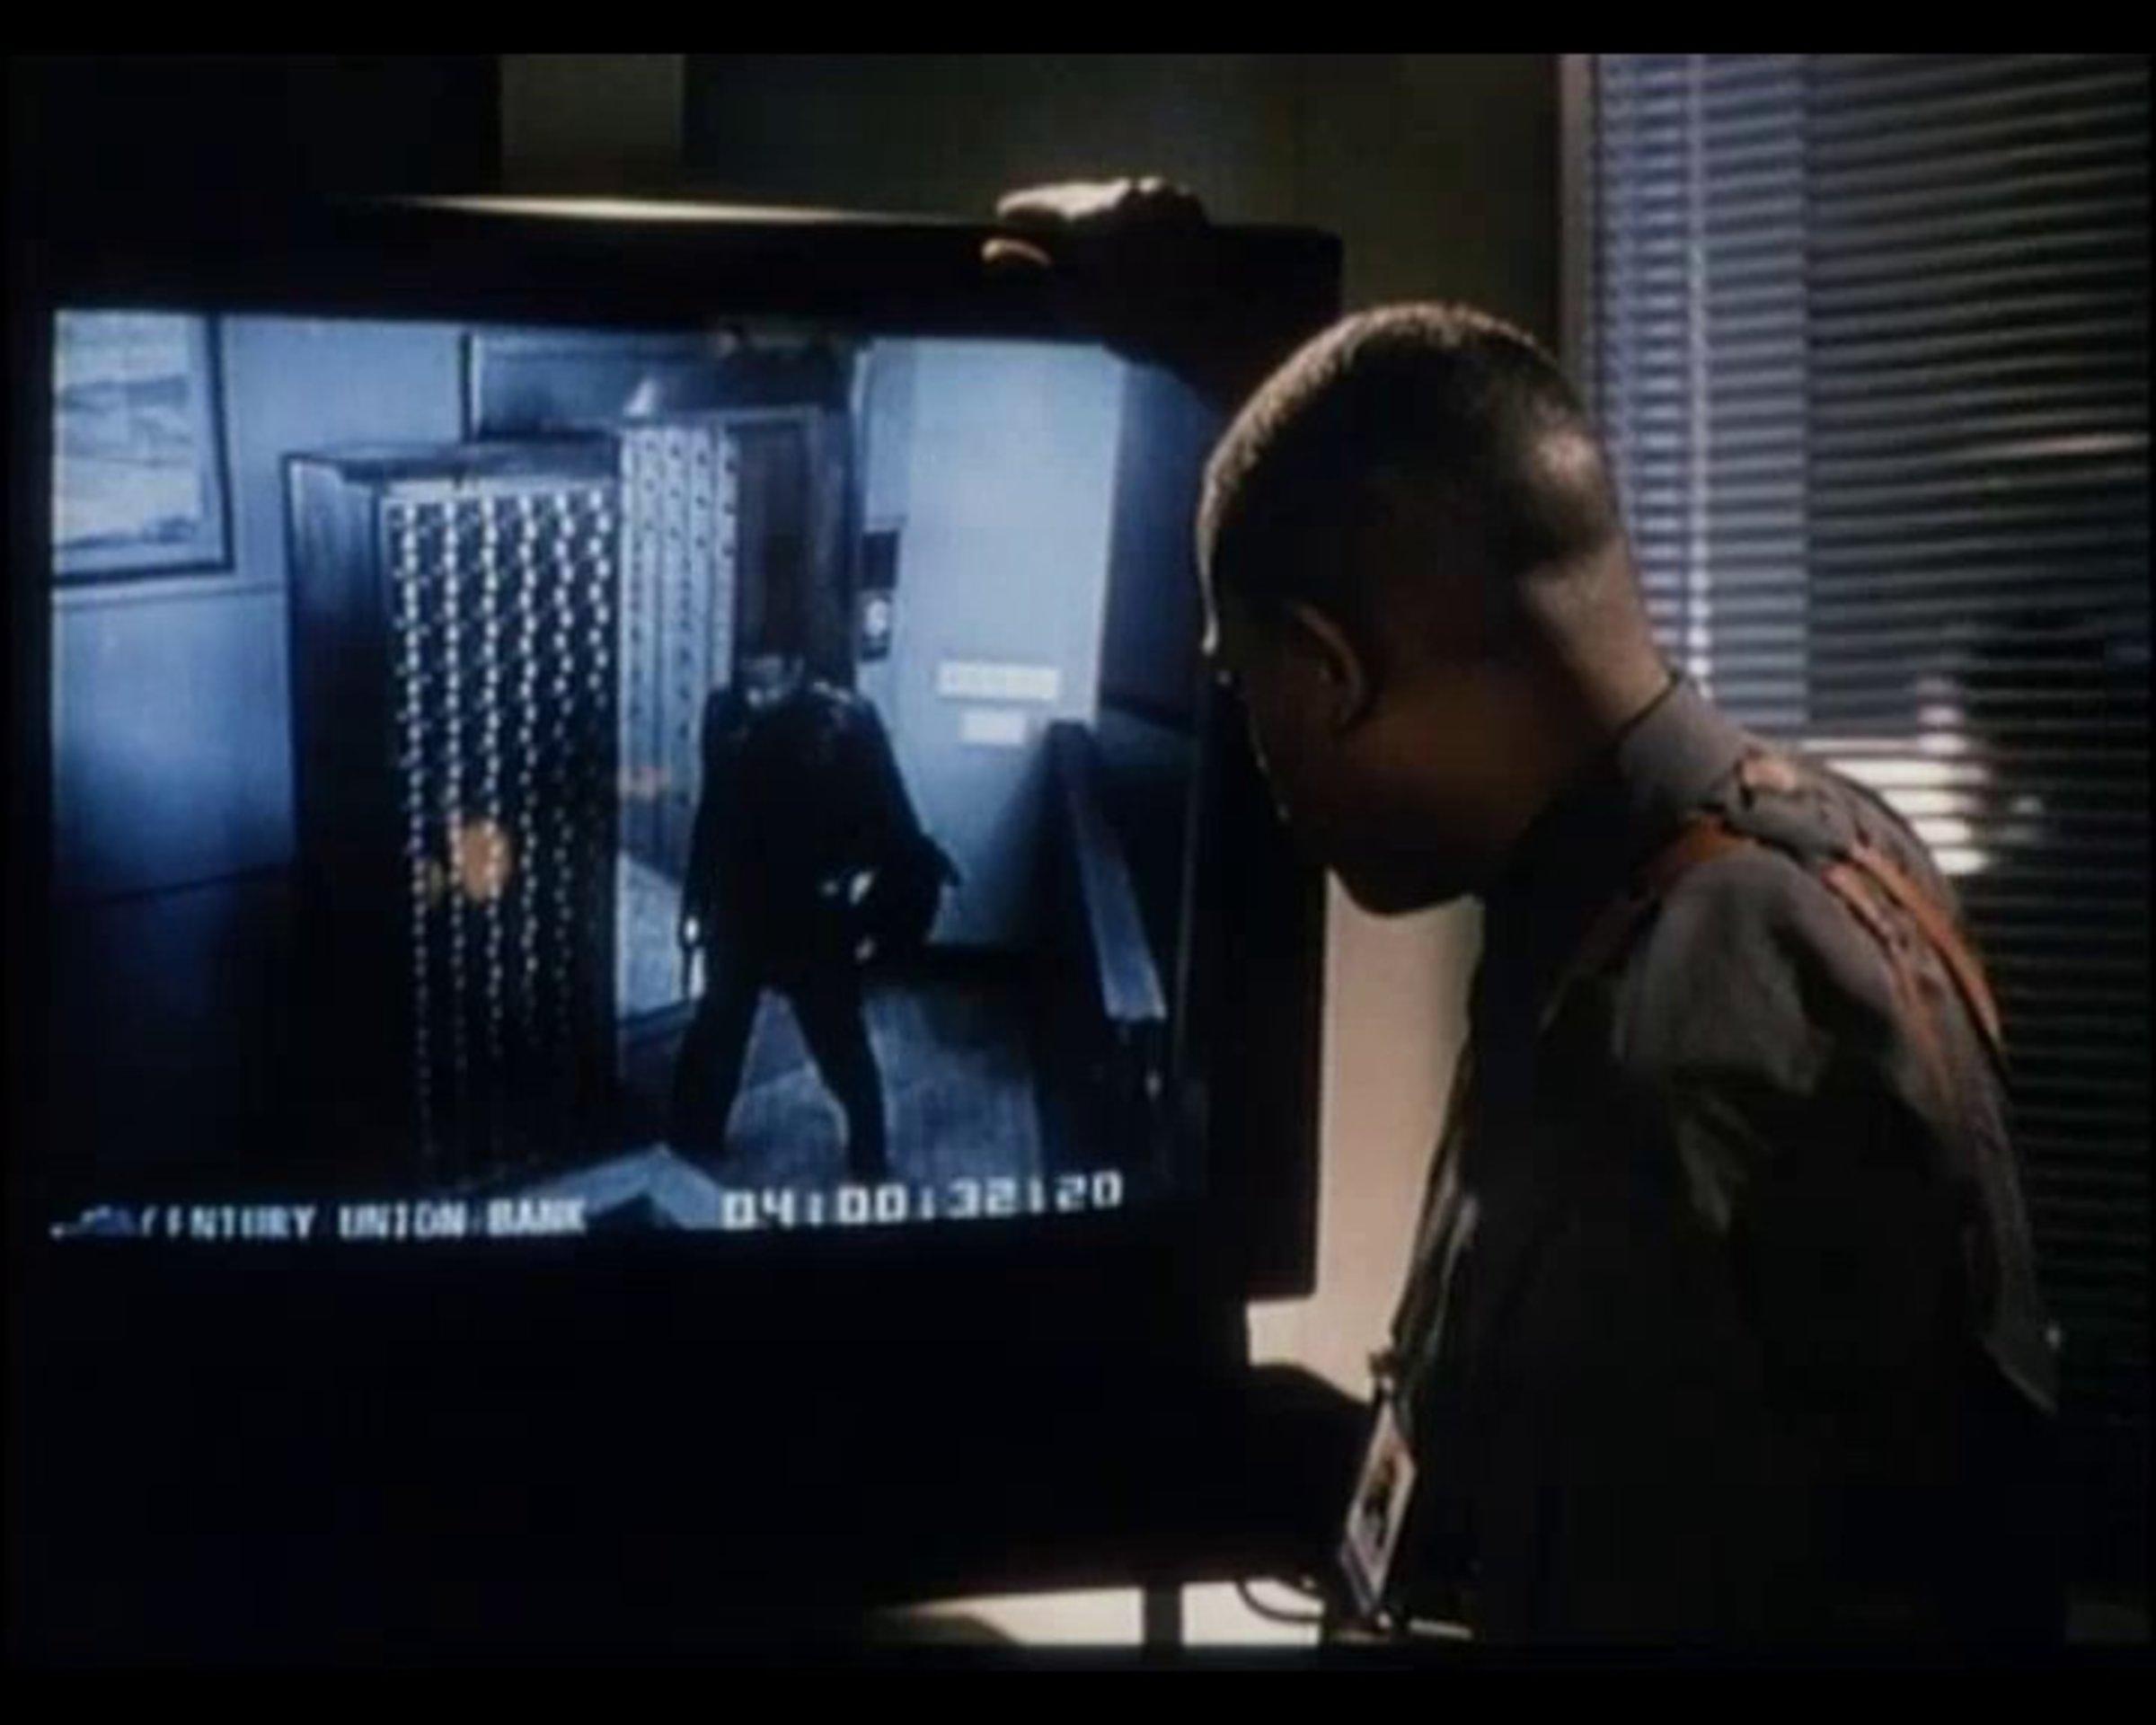 Big mama s haus film 2000 183 trailer 183 kritik 183 kino de